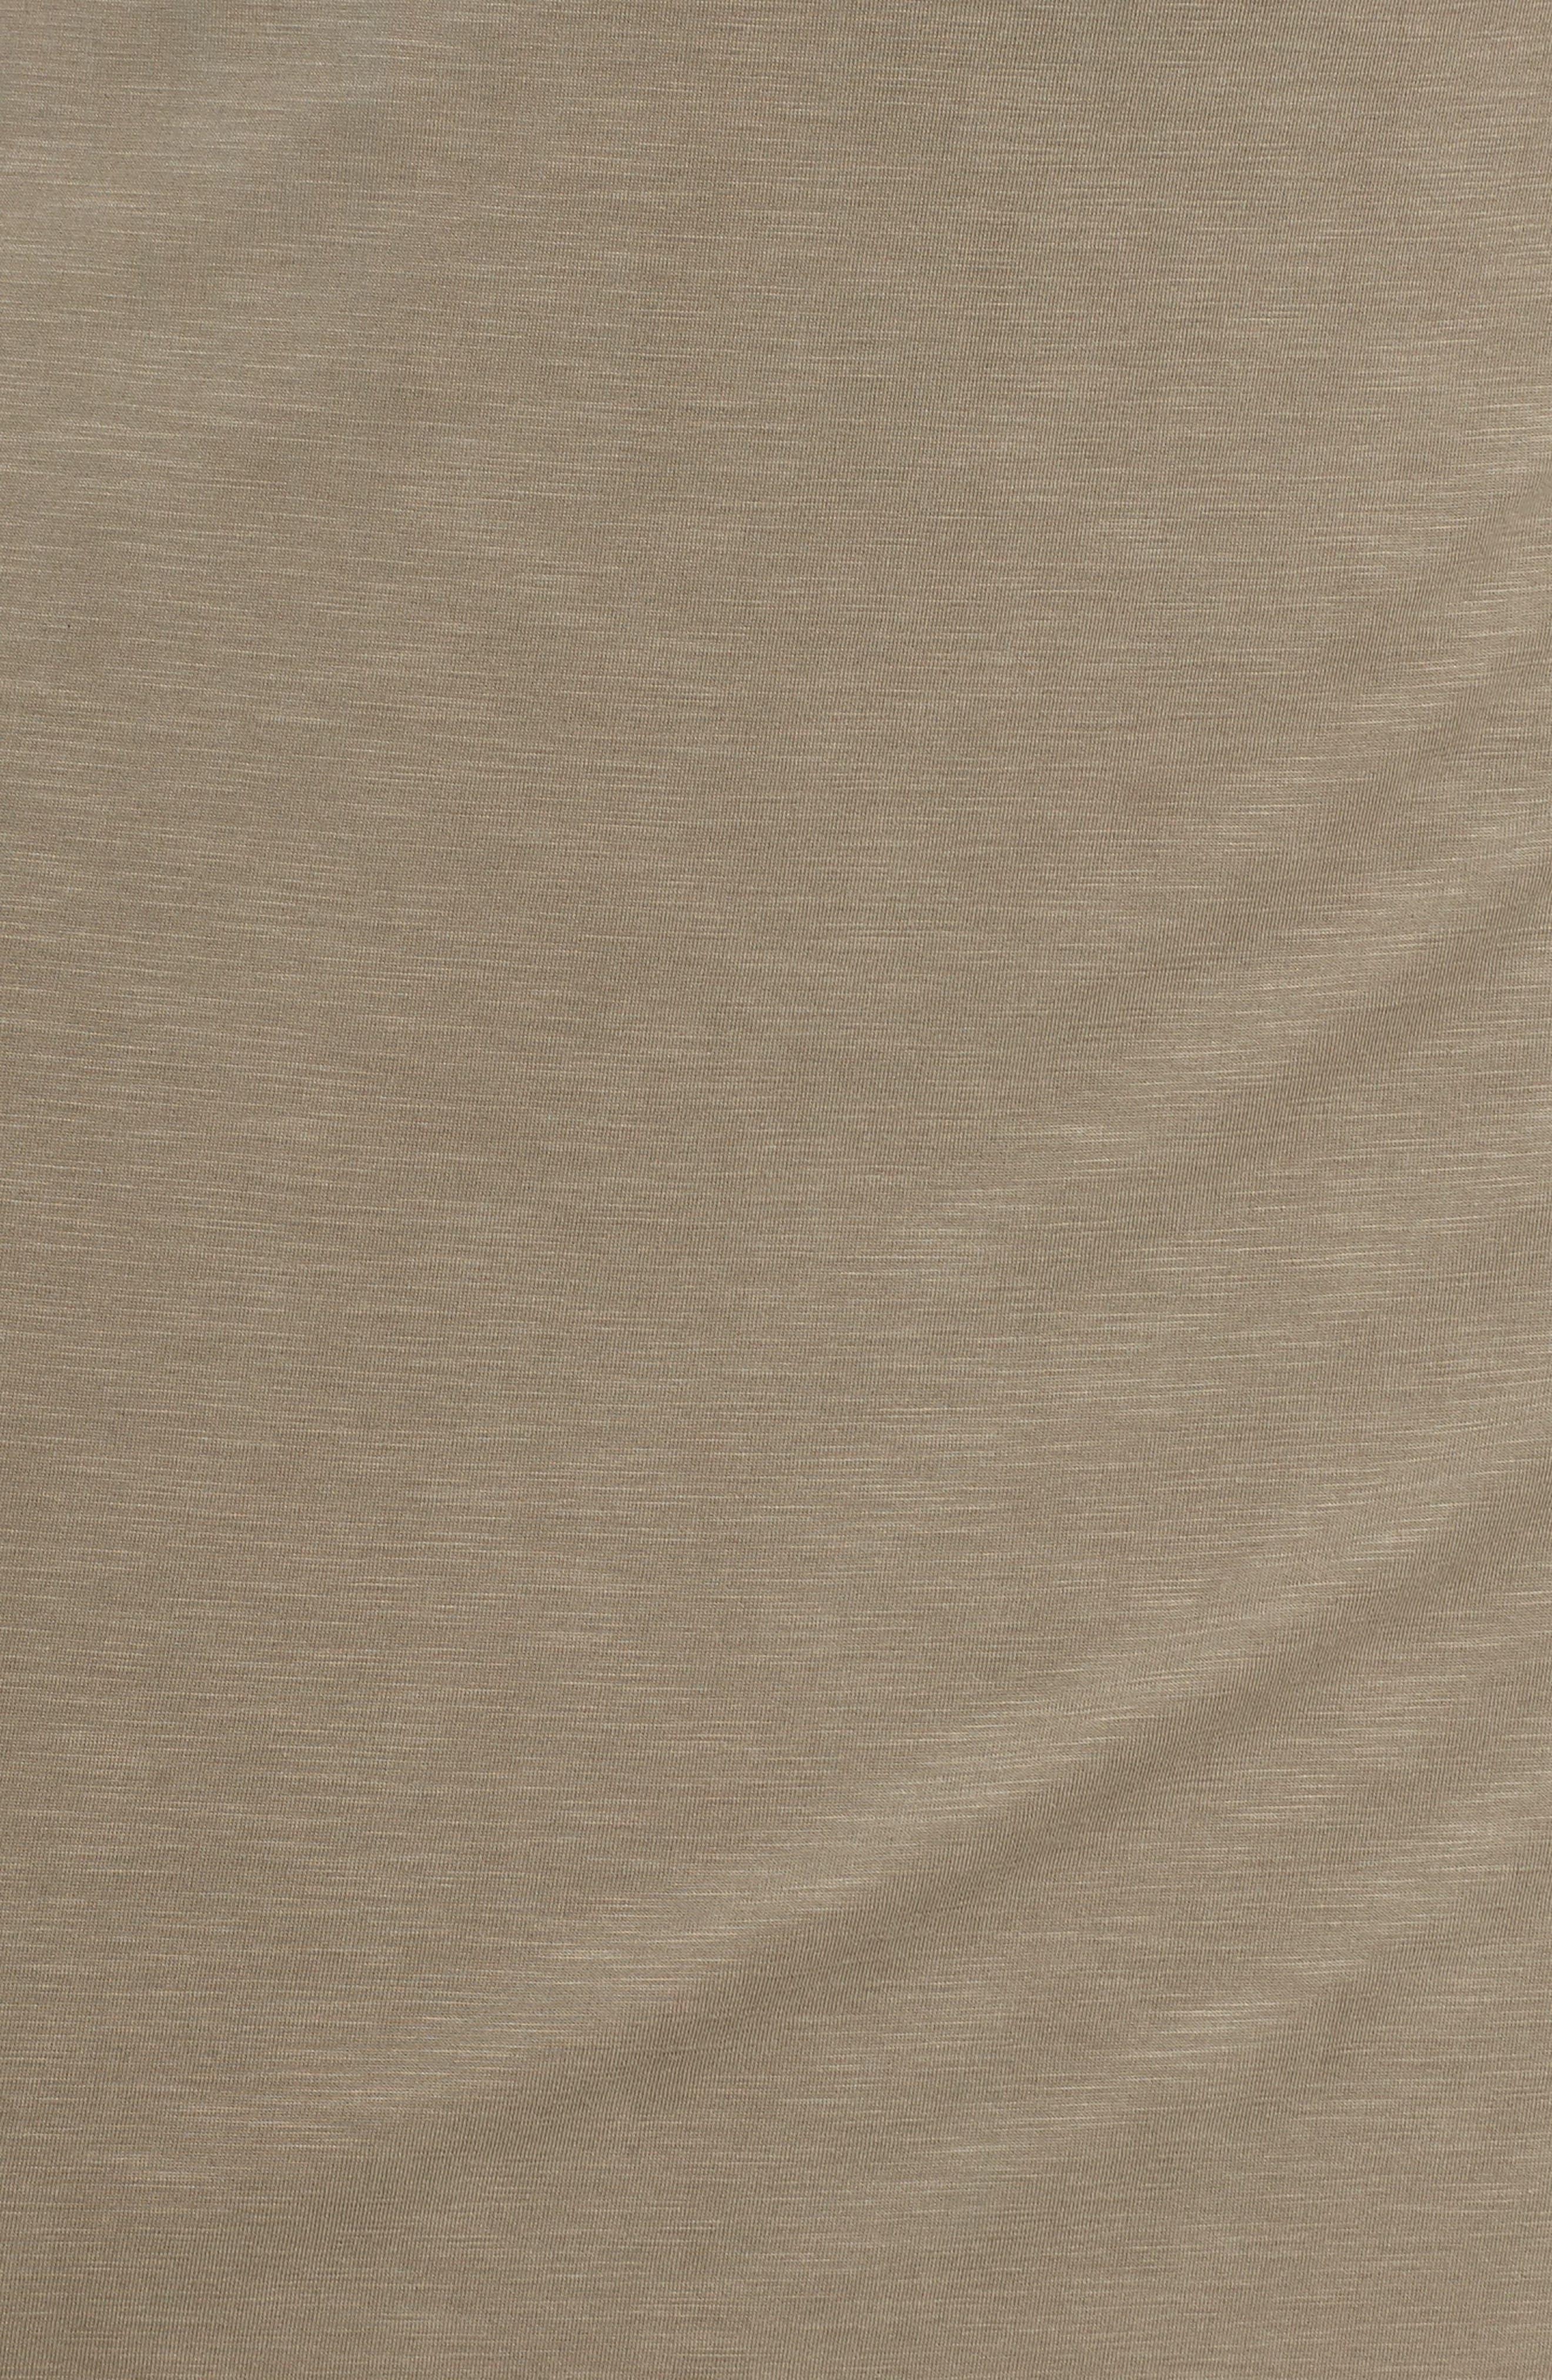 Boardwalk Knit Wrap Maxi Skirt,                             Alternate thumbnail 5, color,                             250